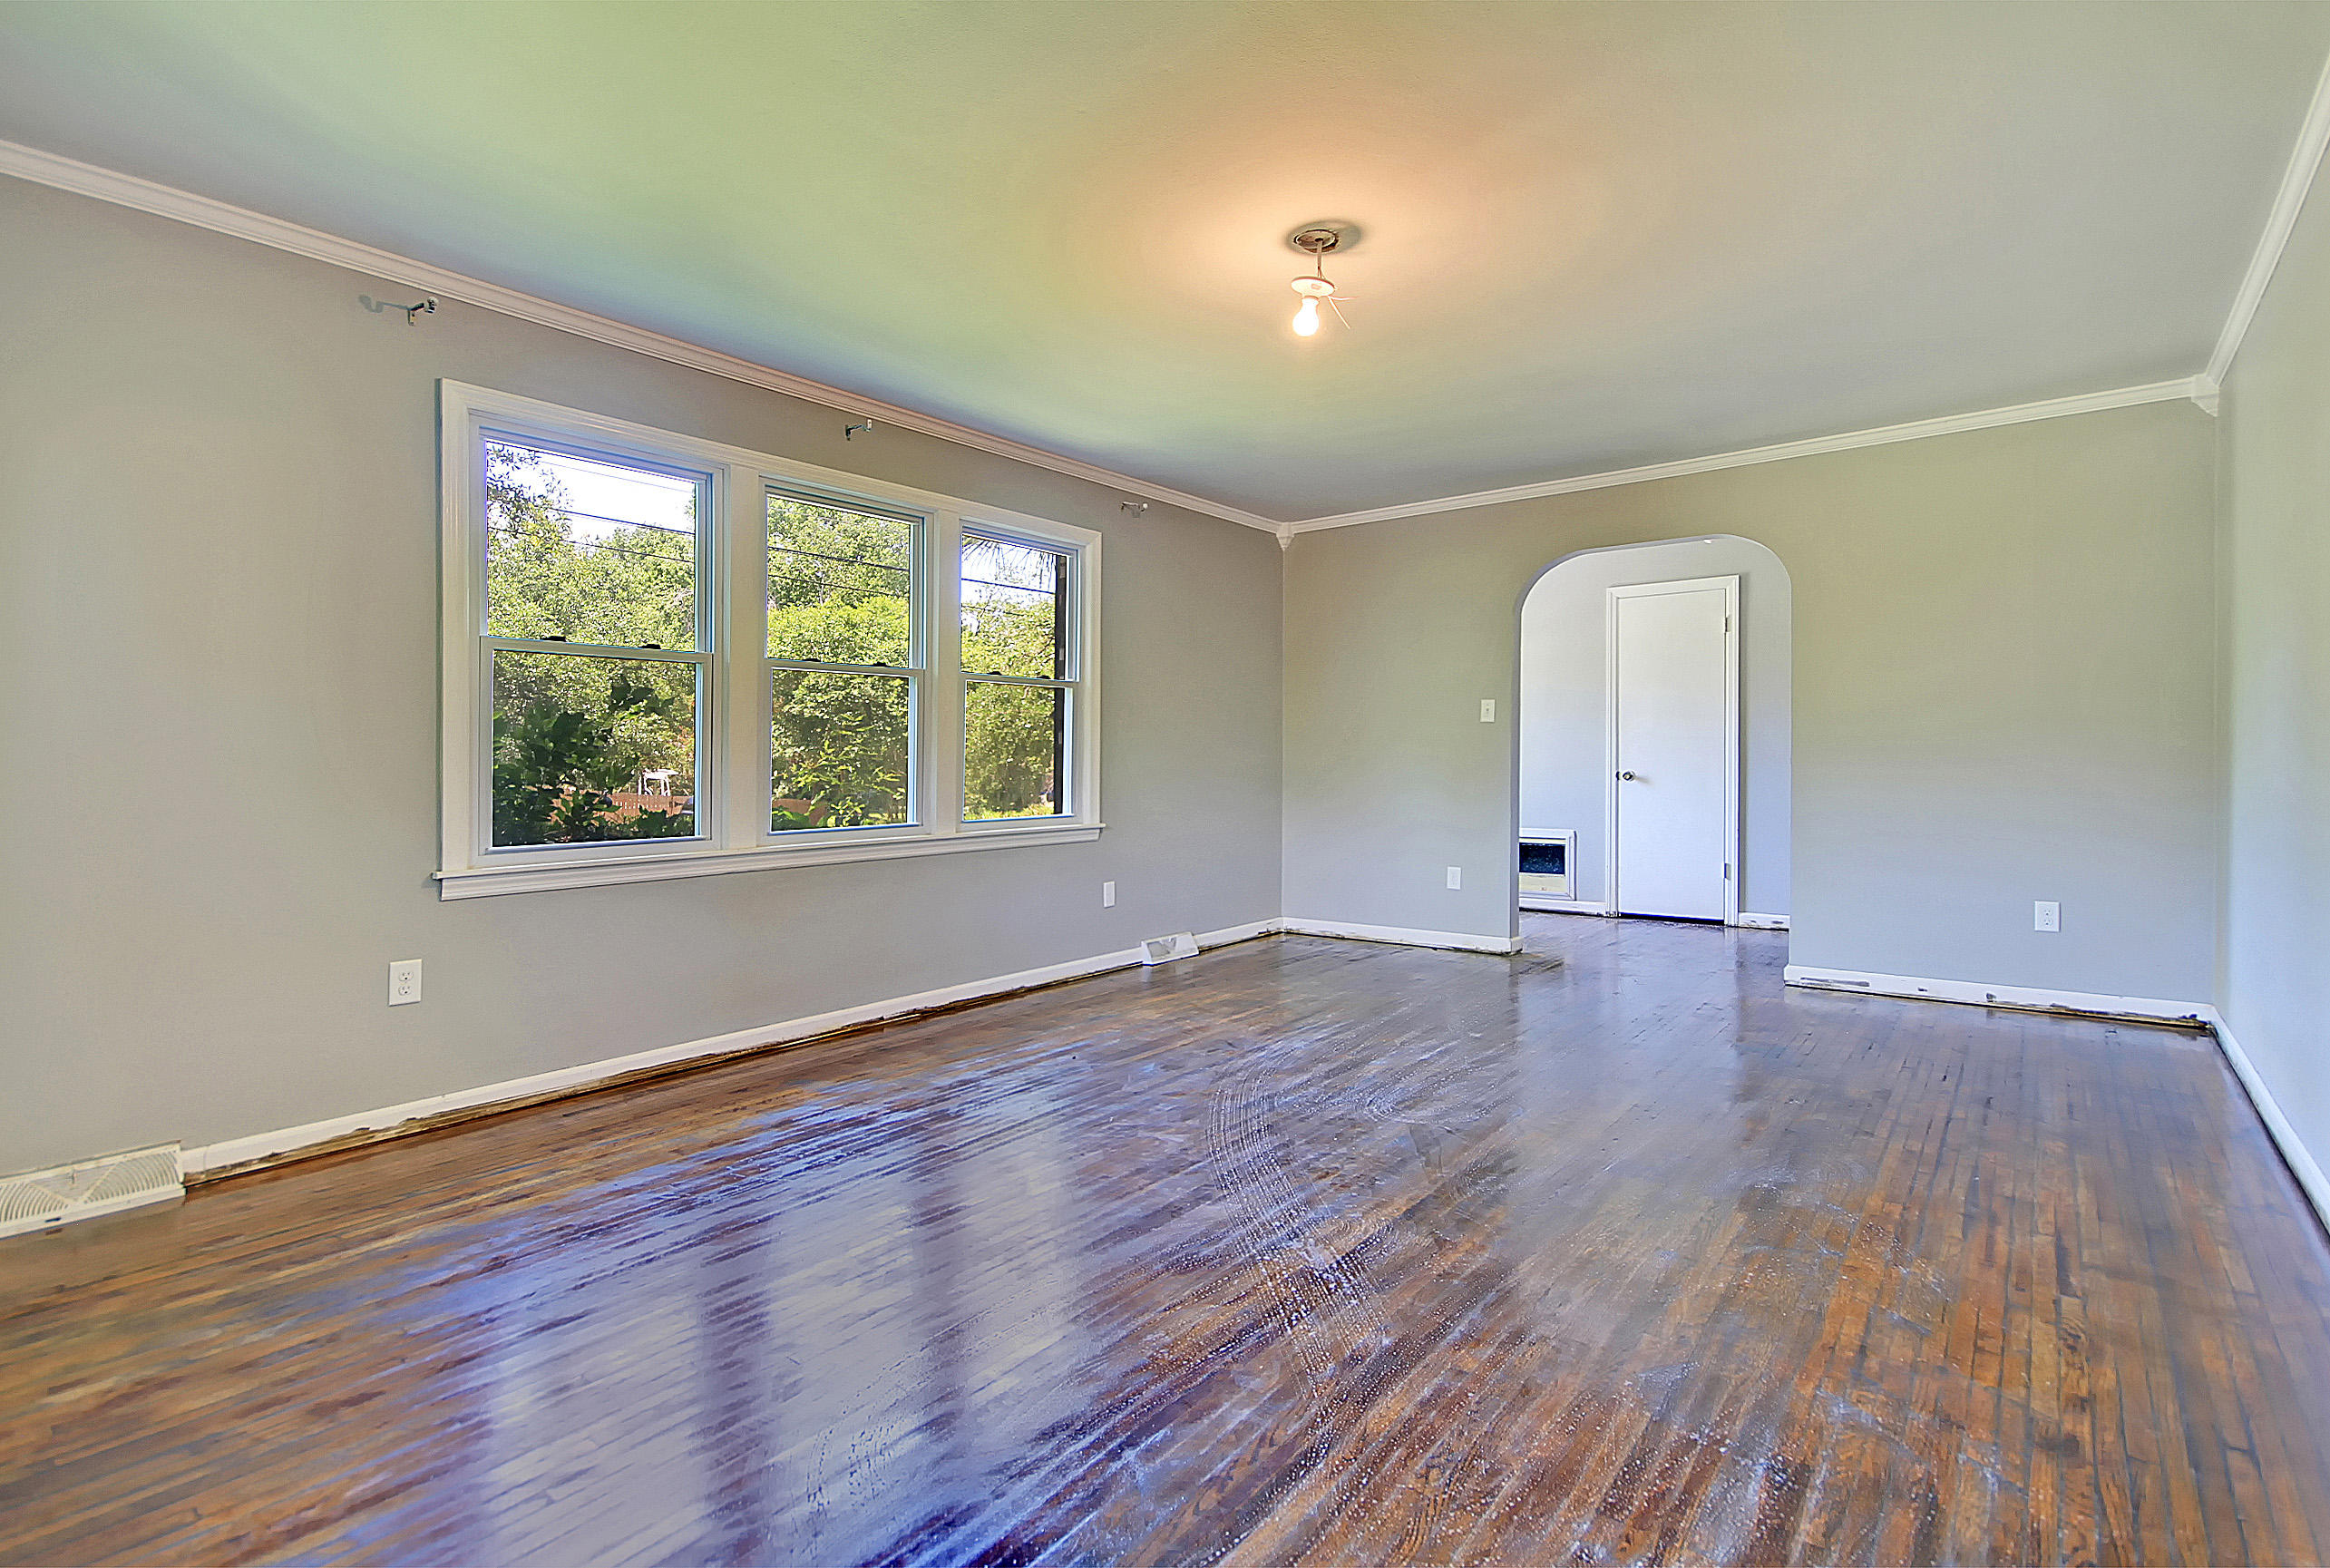 Northbridge Terrace Homes For Sale - 1094 Northbridge, Charleston, SC - 29